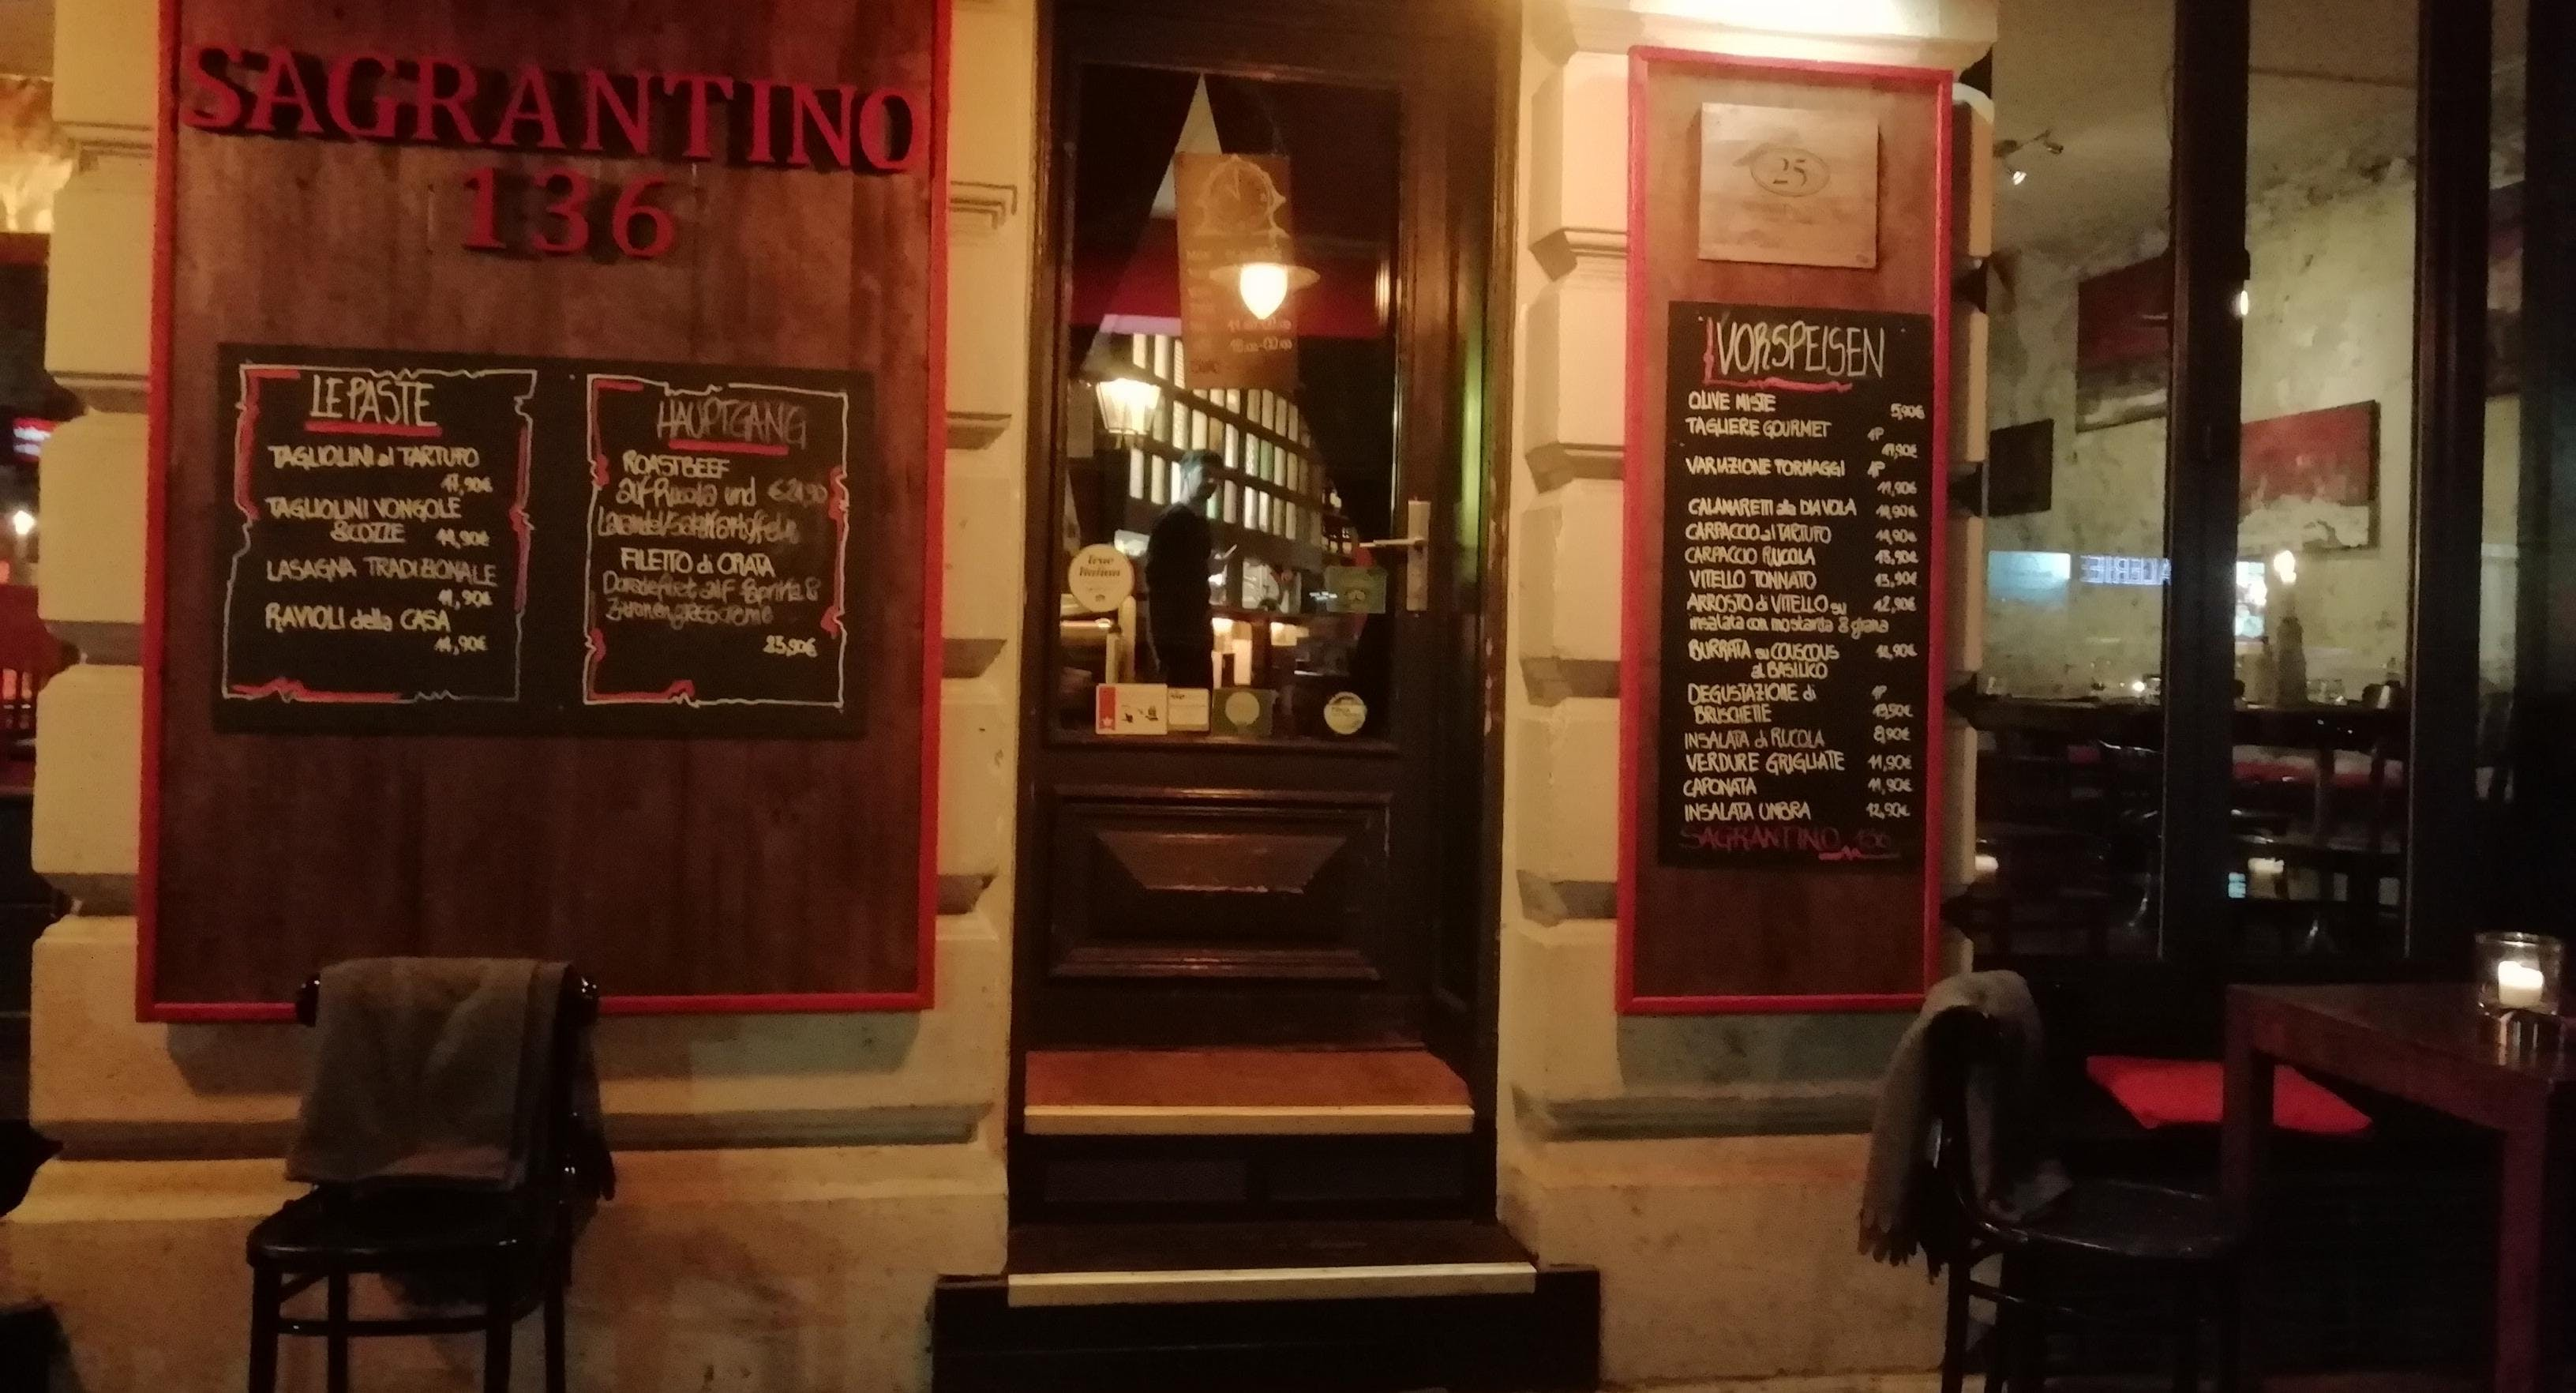 Sagrantino136 Berlin image 1